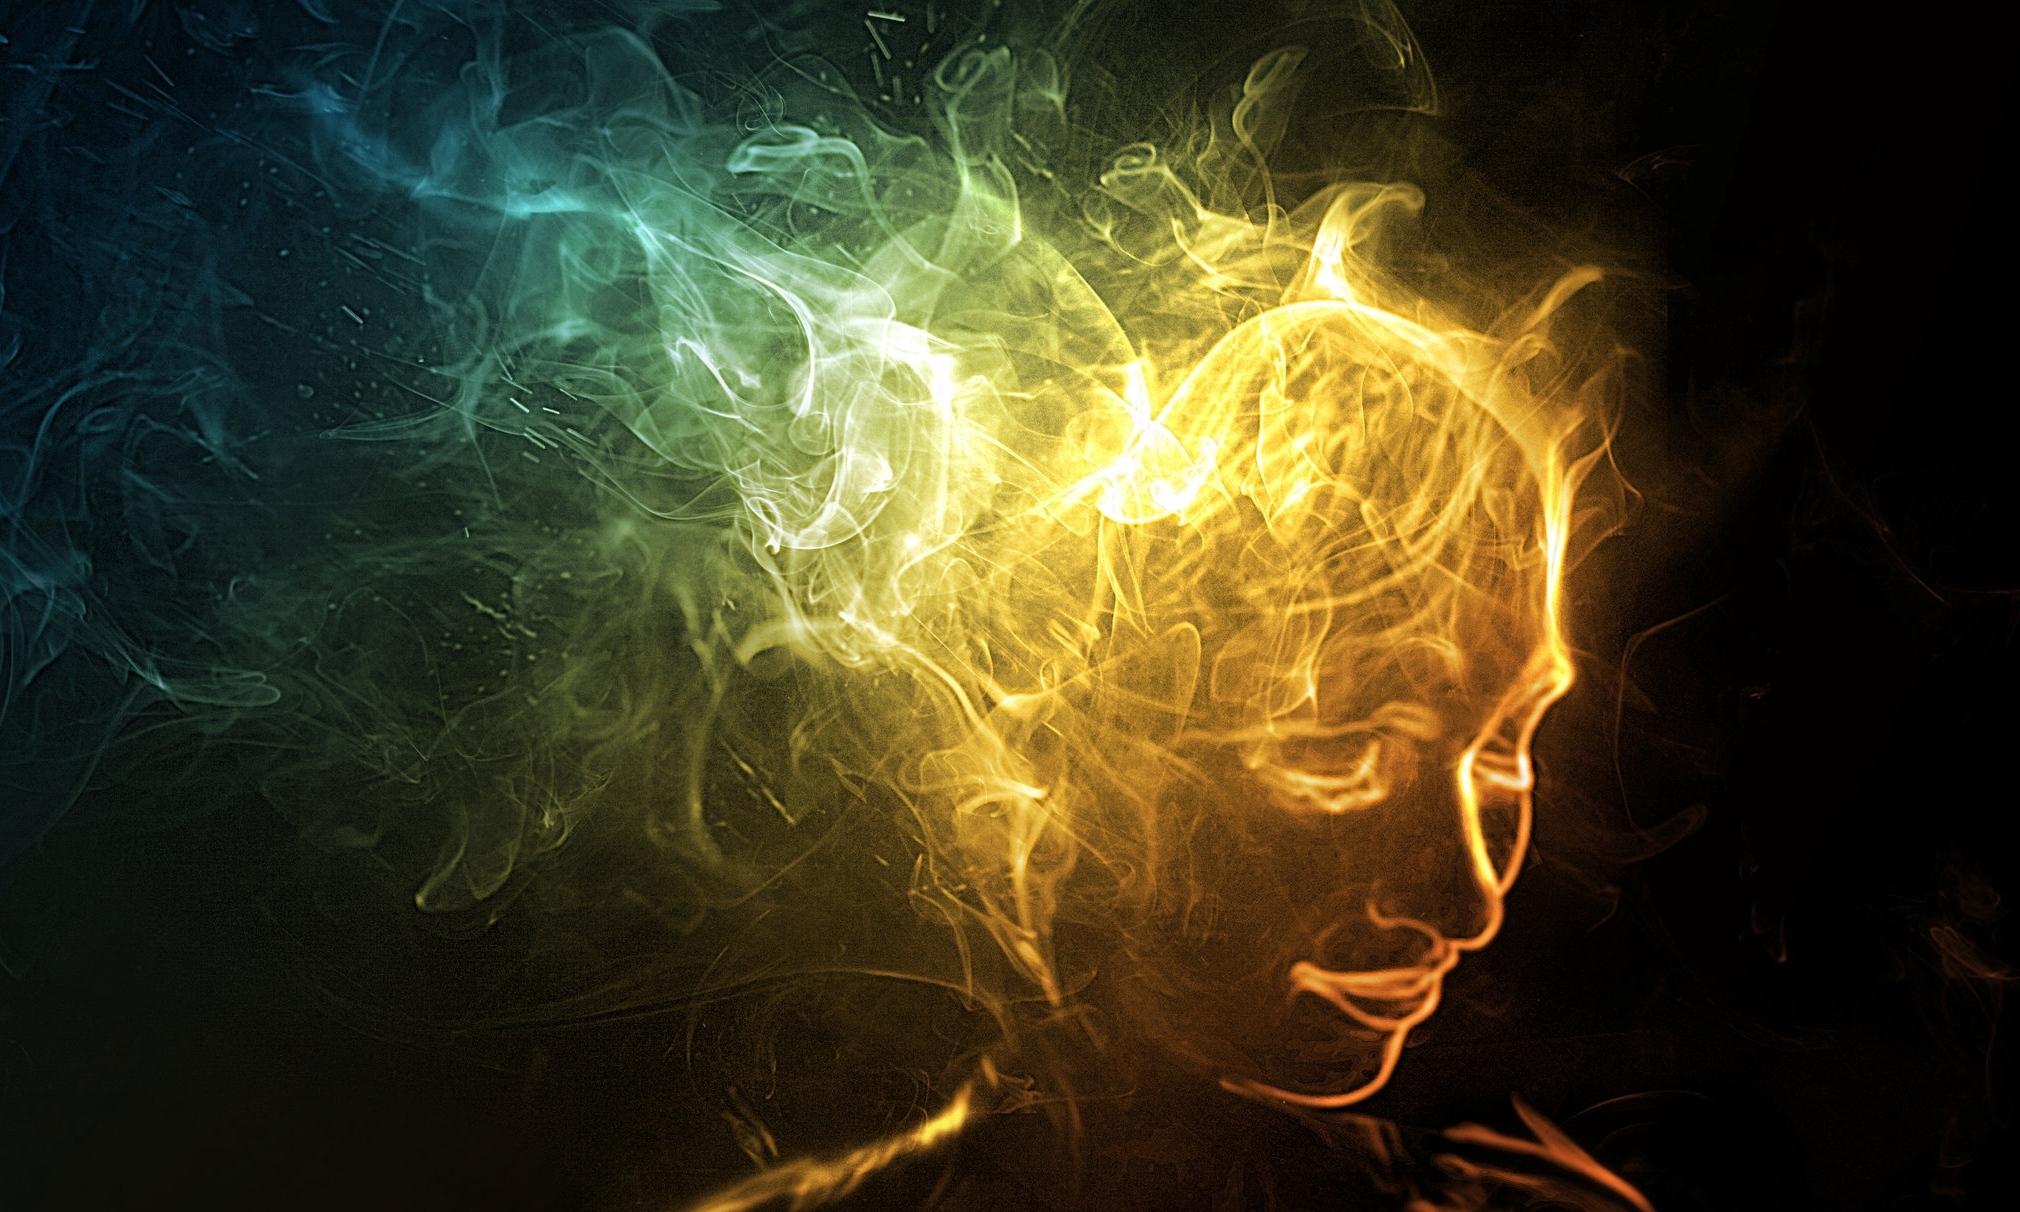 Memory & Brain Issues